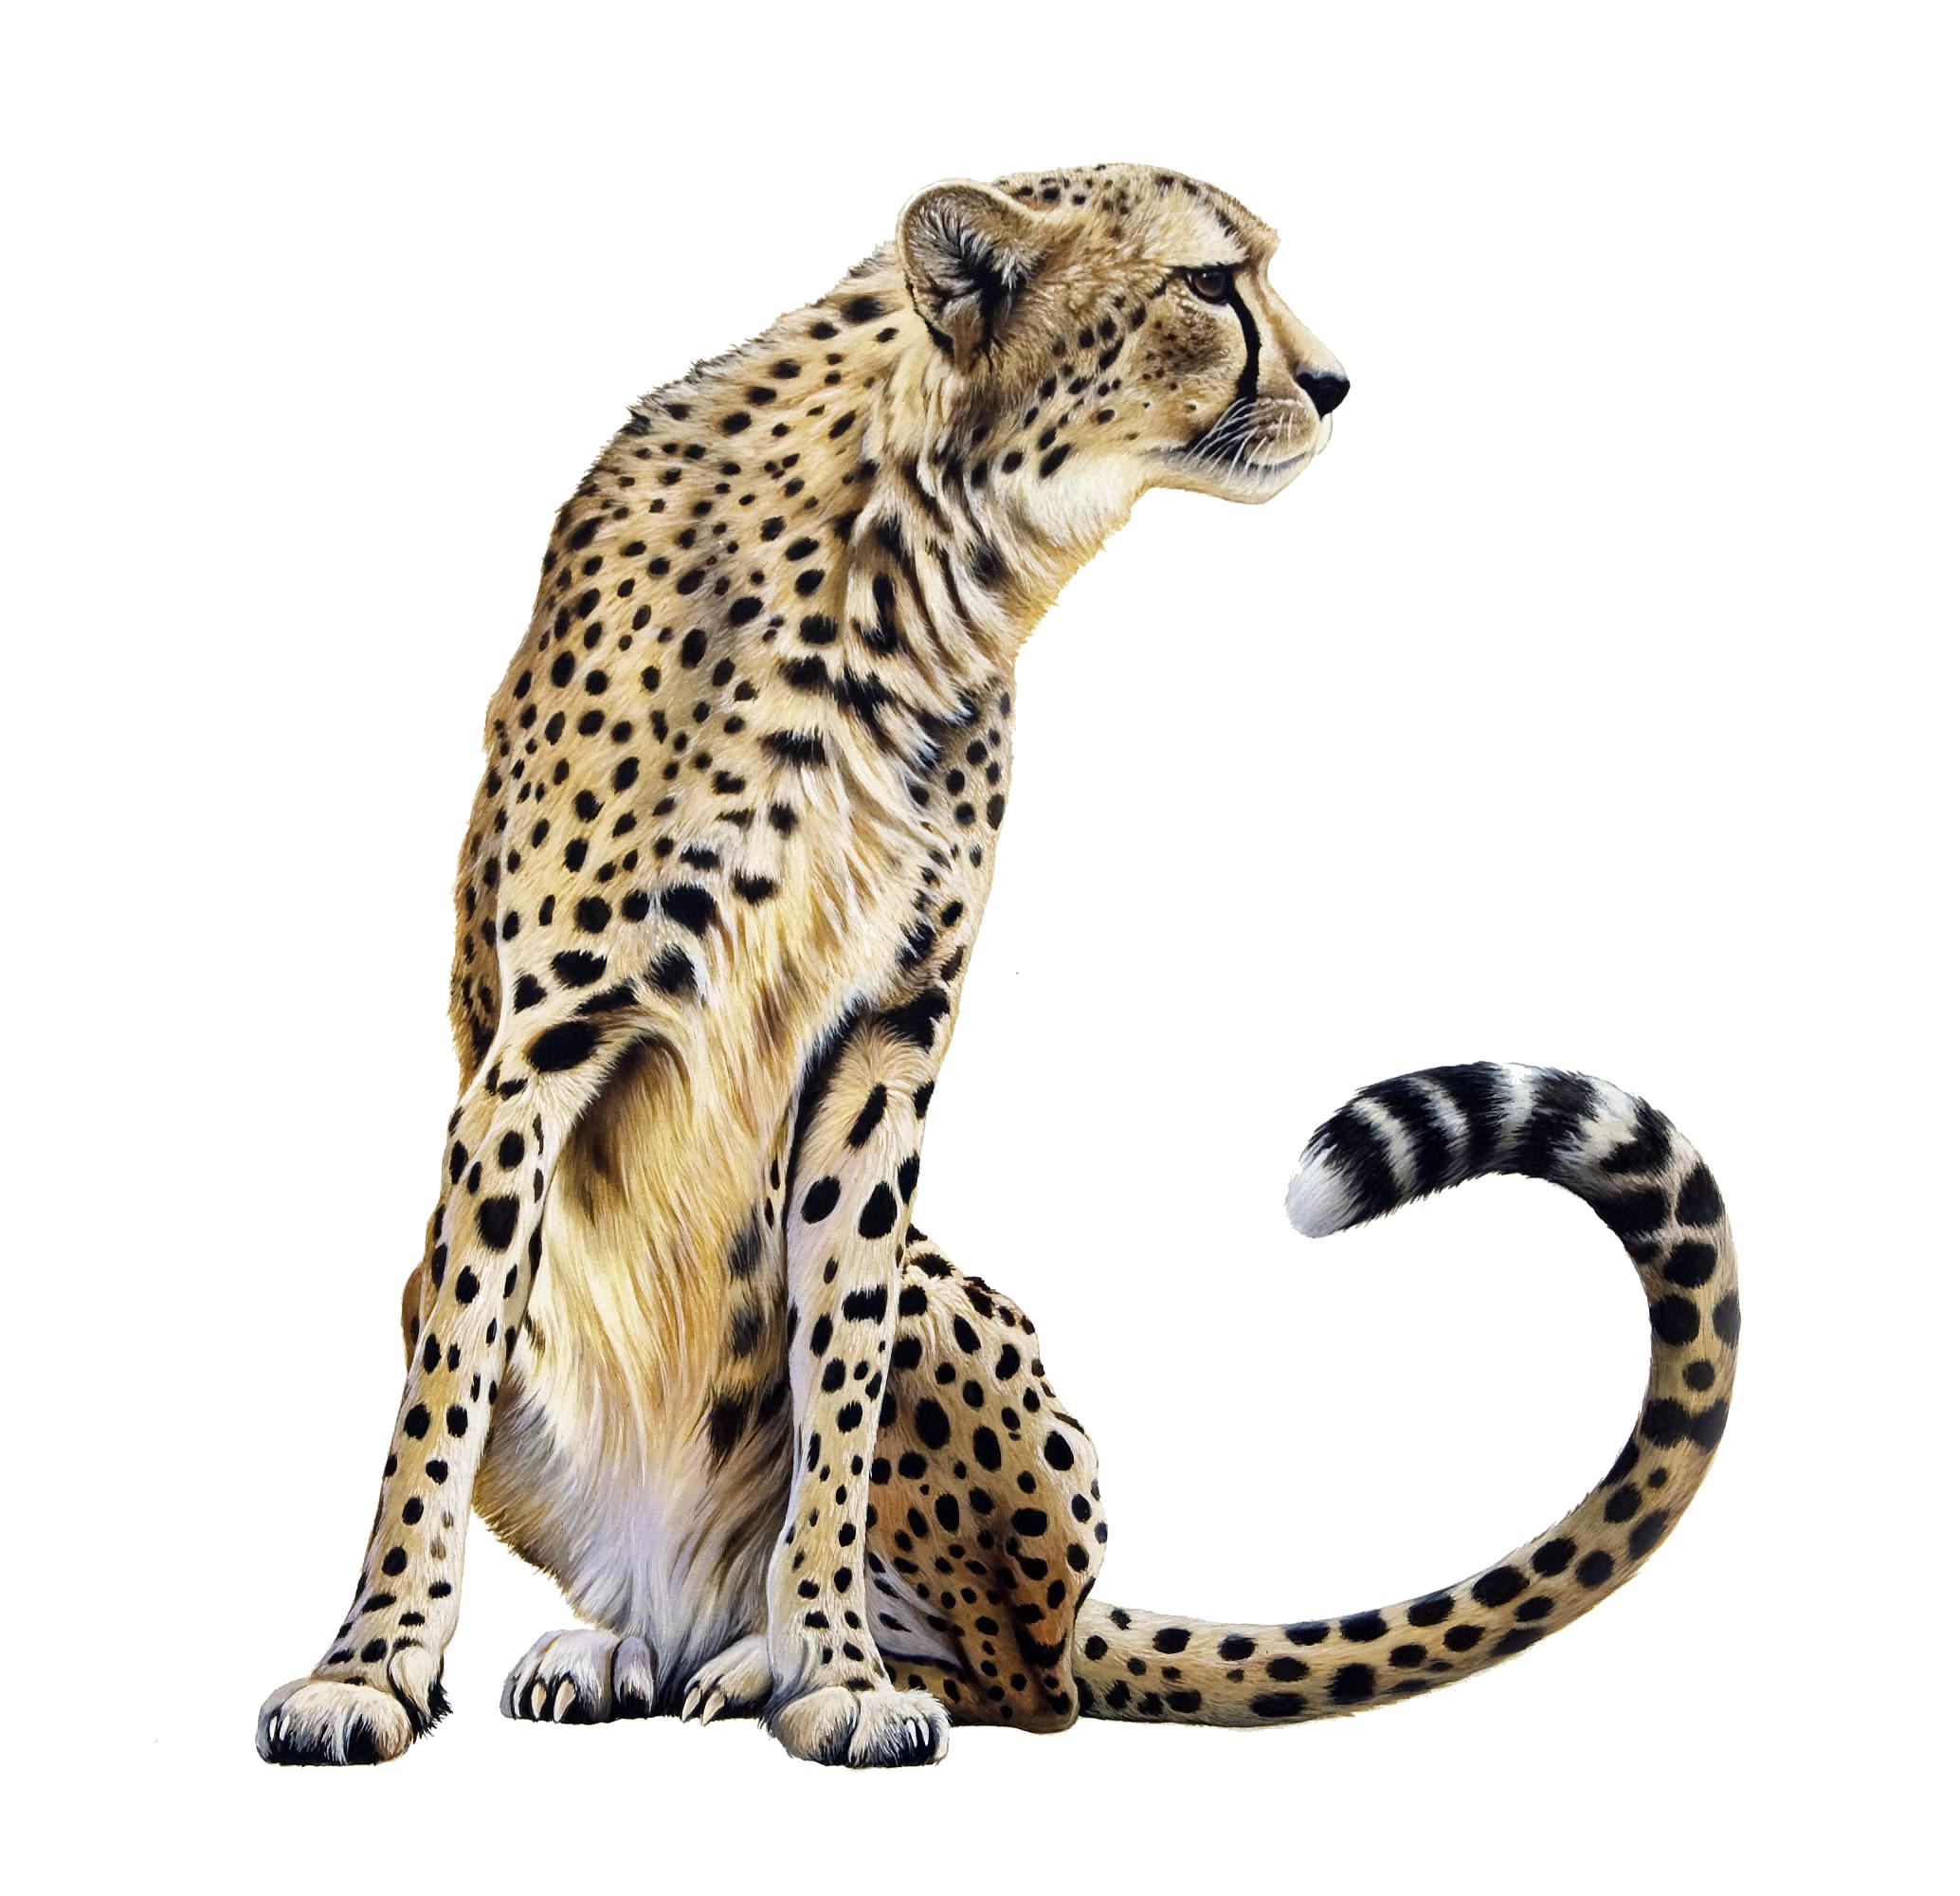 Cheetah book clipart jpg black and white library HQ Cheetah PNG Transparent Cheetah.PNG Images. | PlusPNG jpg black and white library